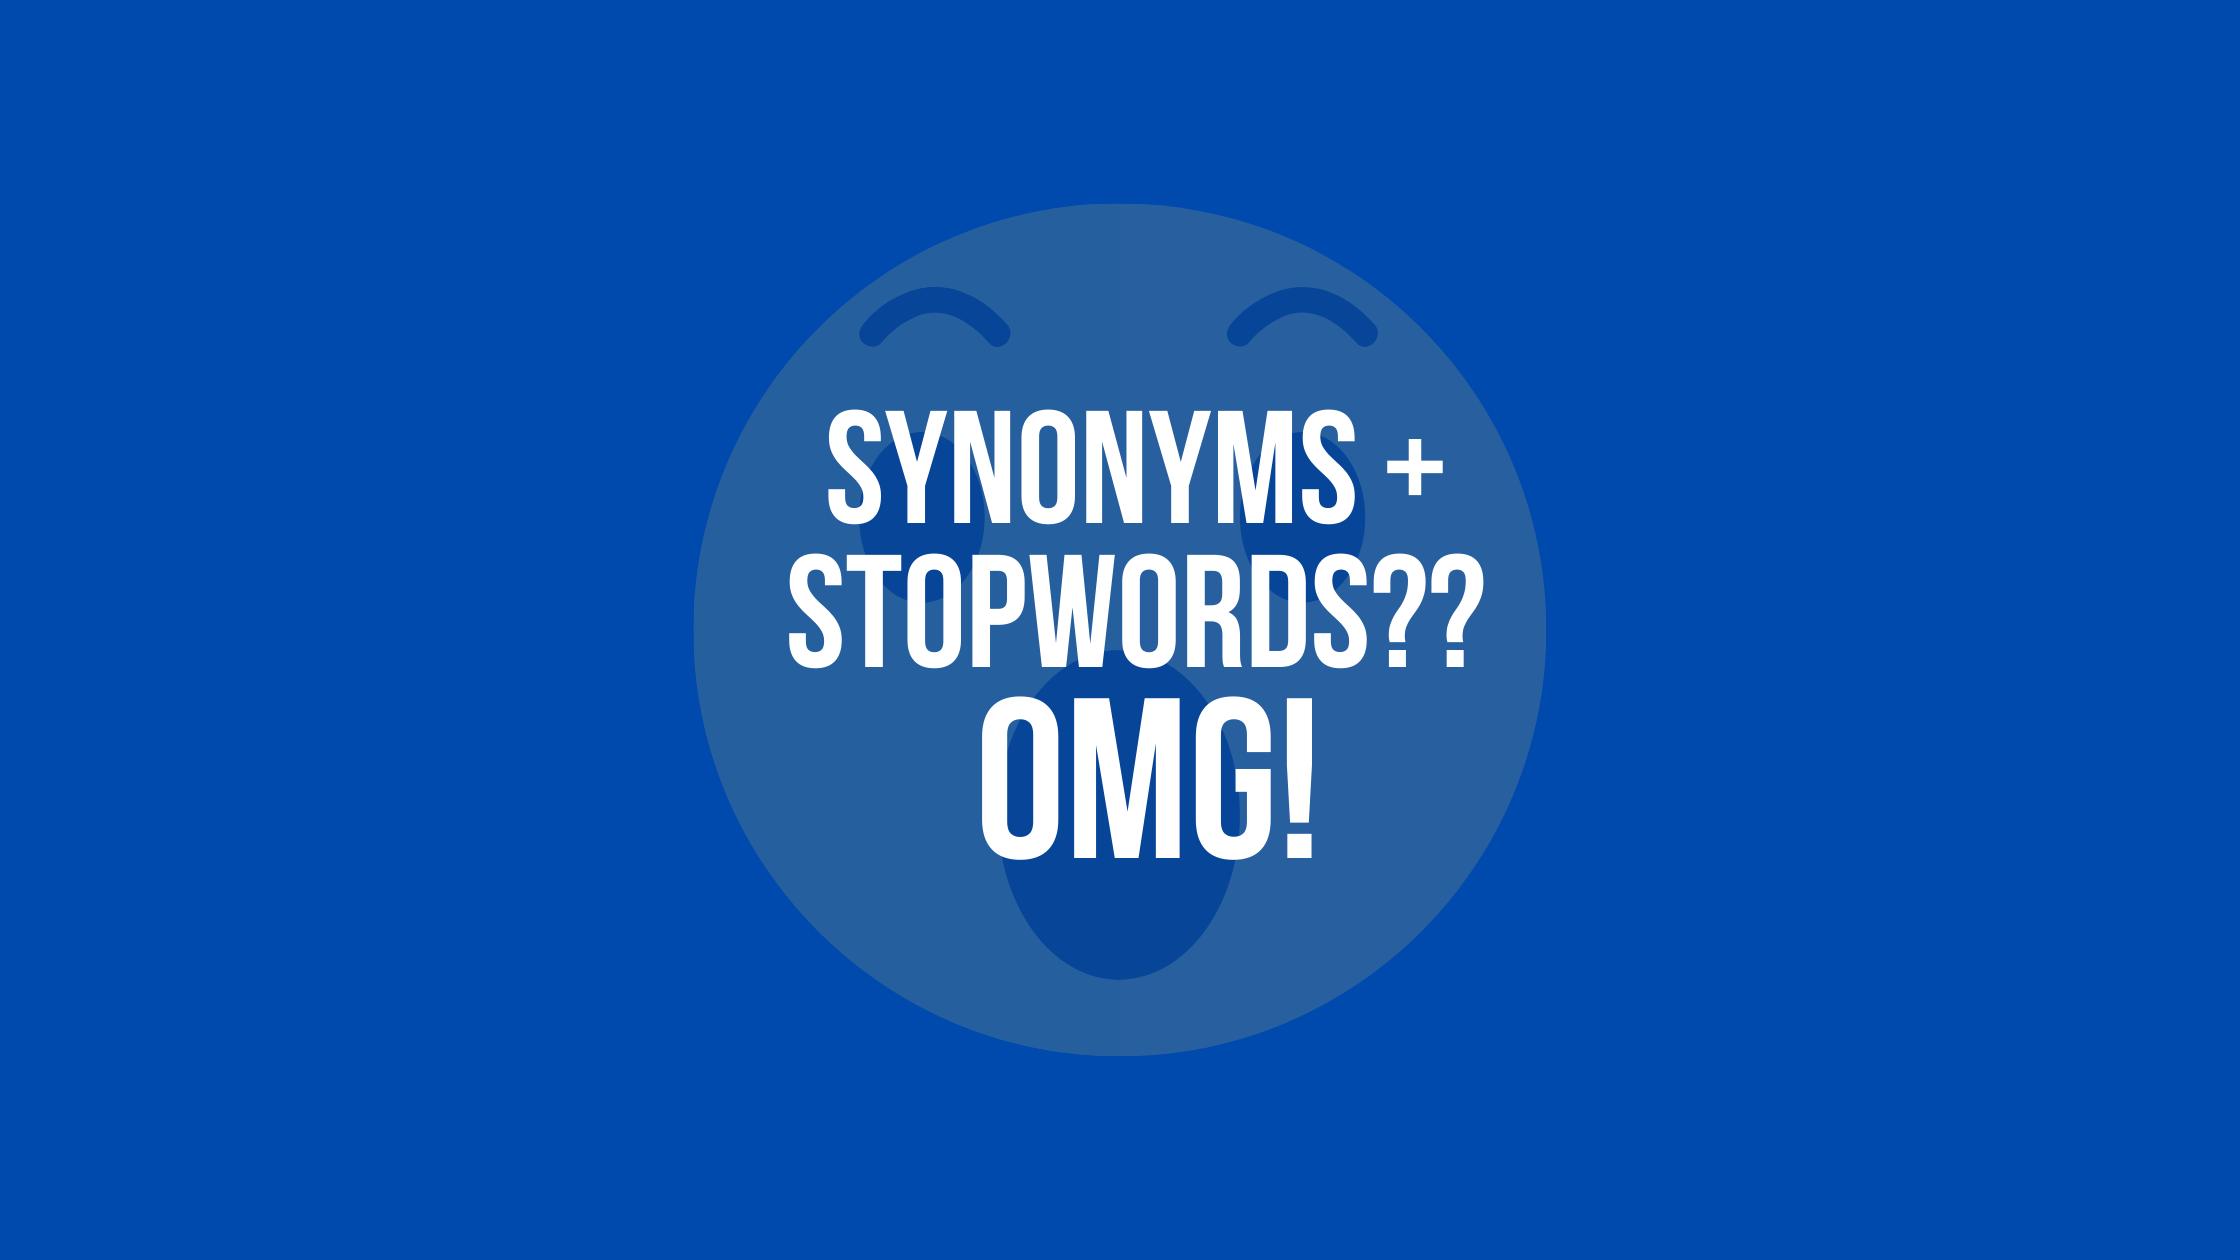 Synonyms + Stopwords?? OMG!